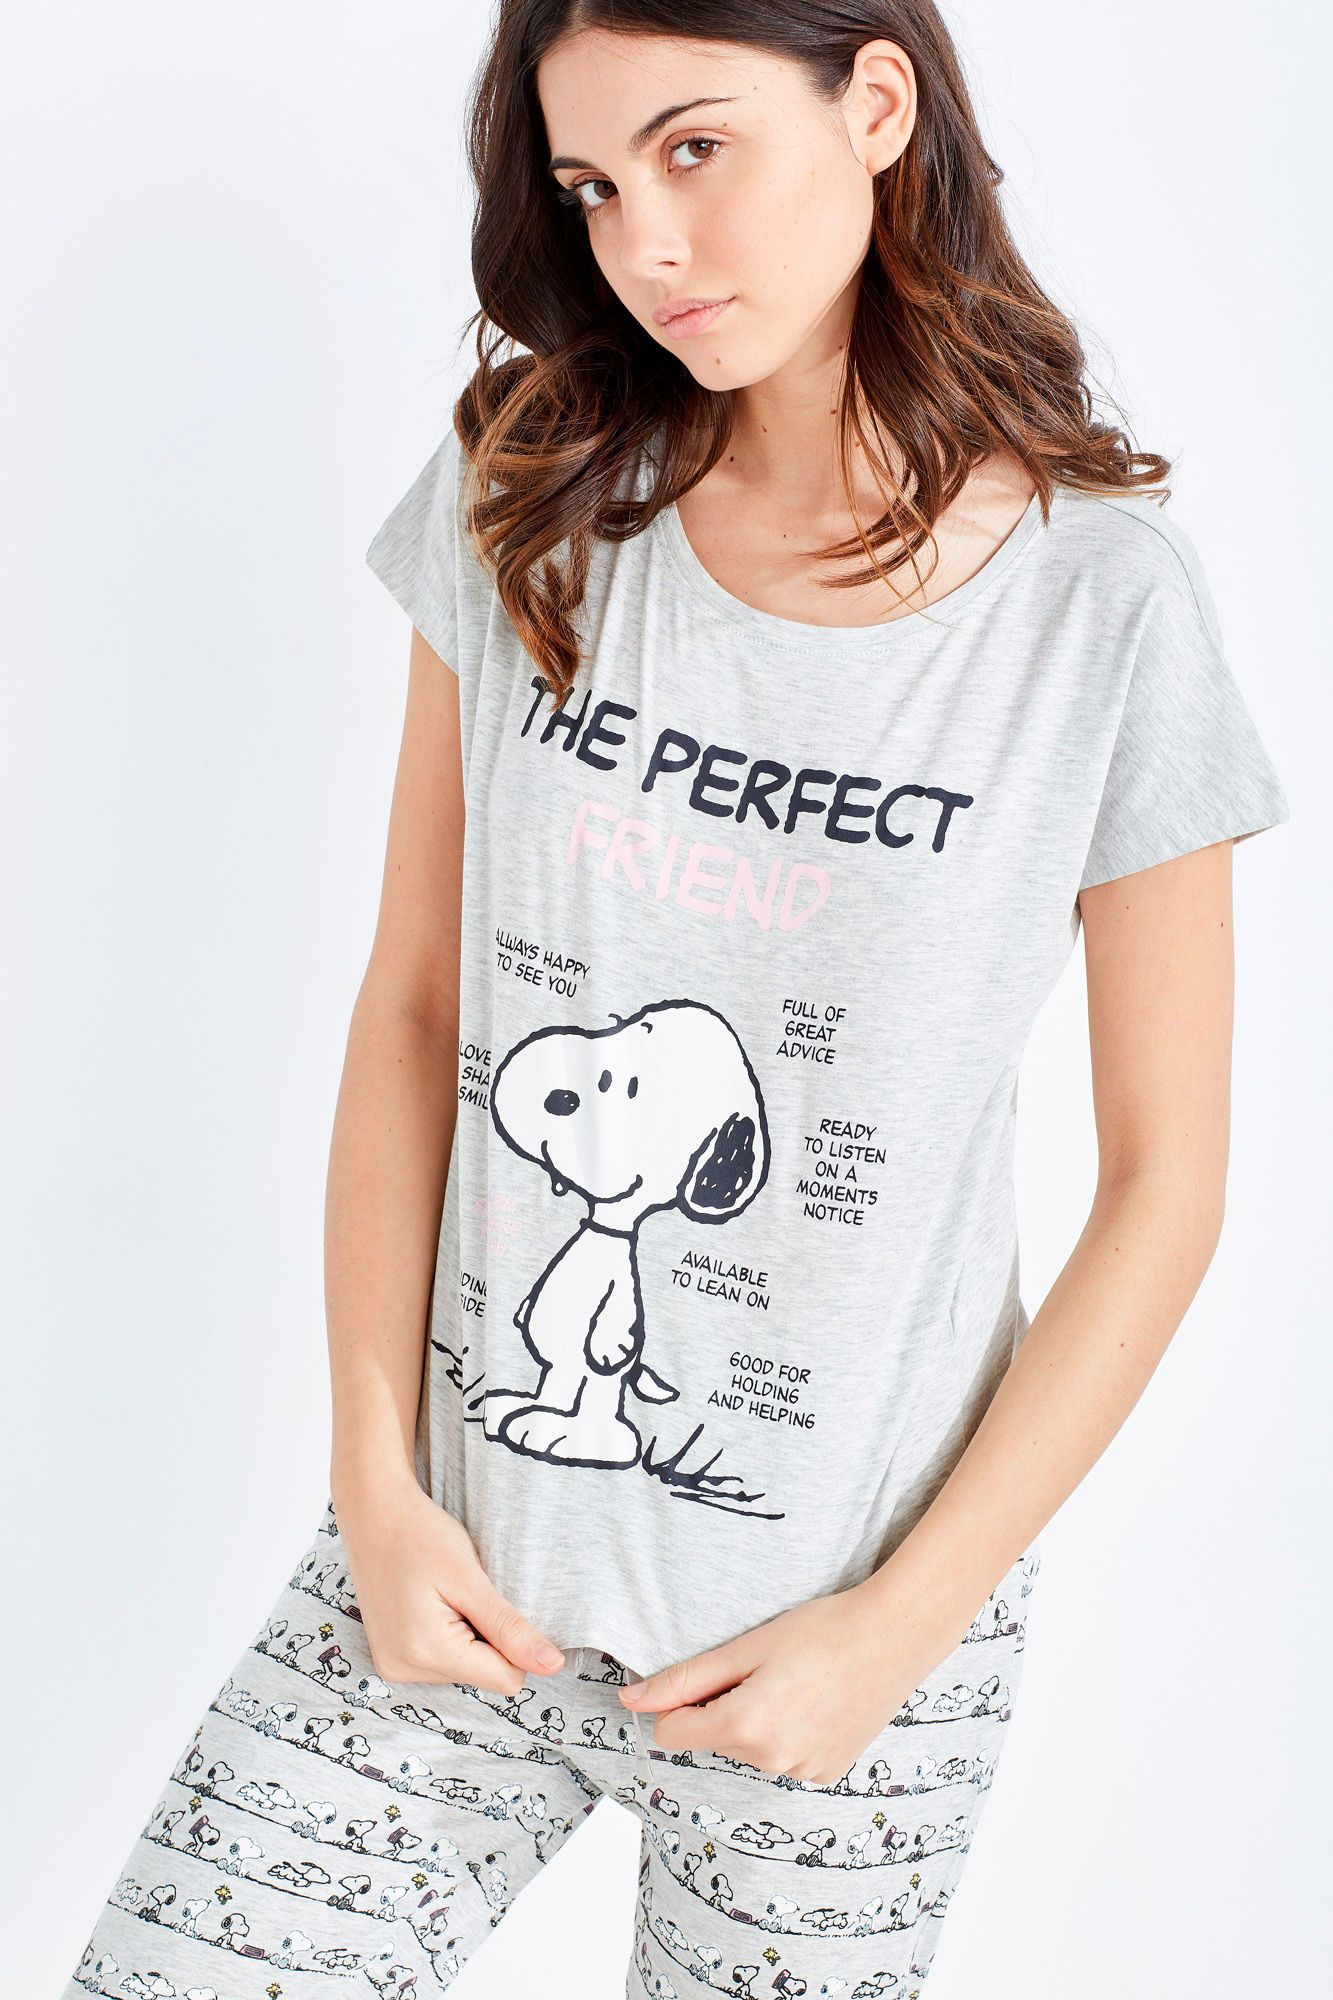 b1c7926f76 Pijama de algodón Snoopy  The perfect friend